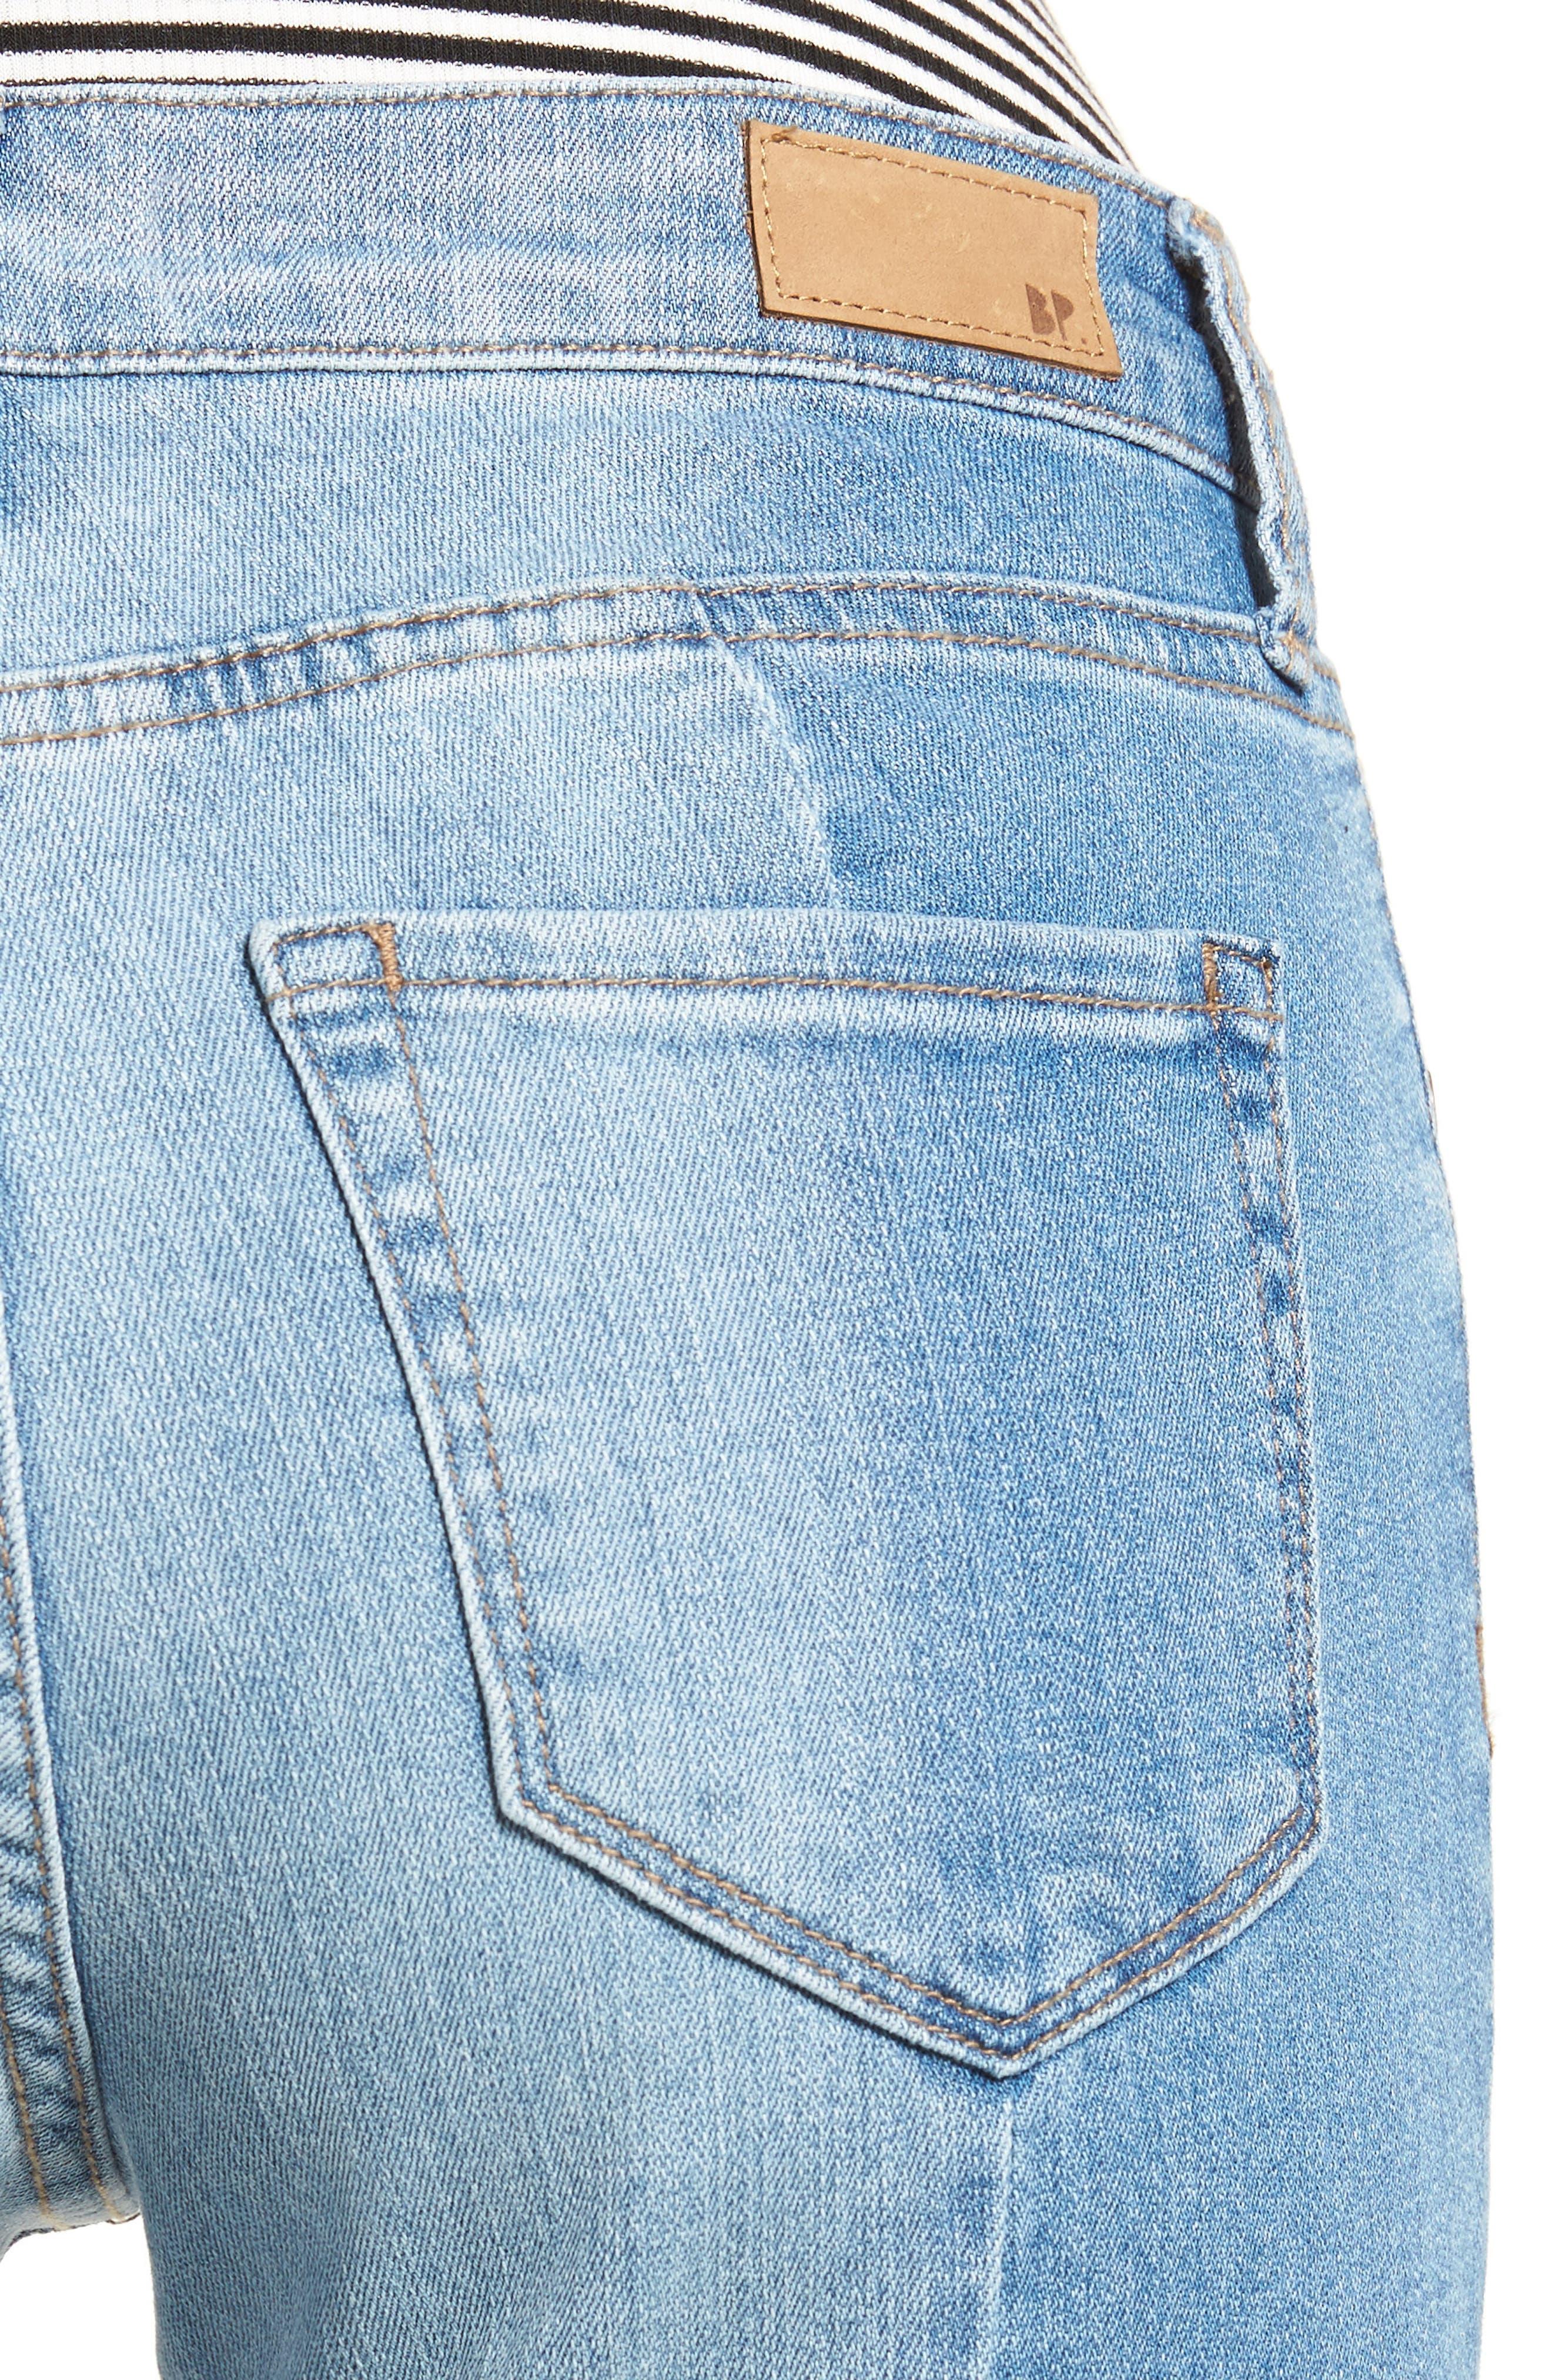 Alternate Image 4  - BP. Straight Colorblock Jeans